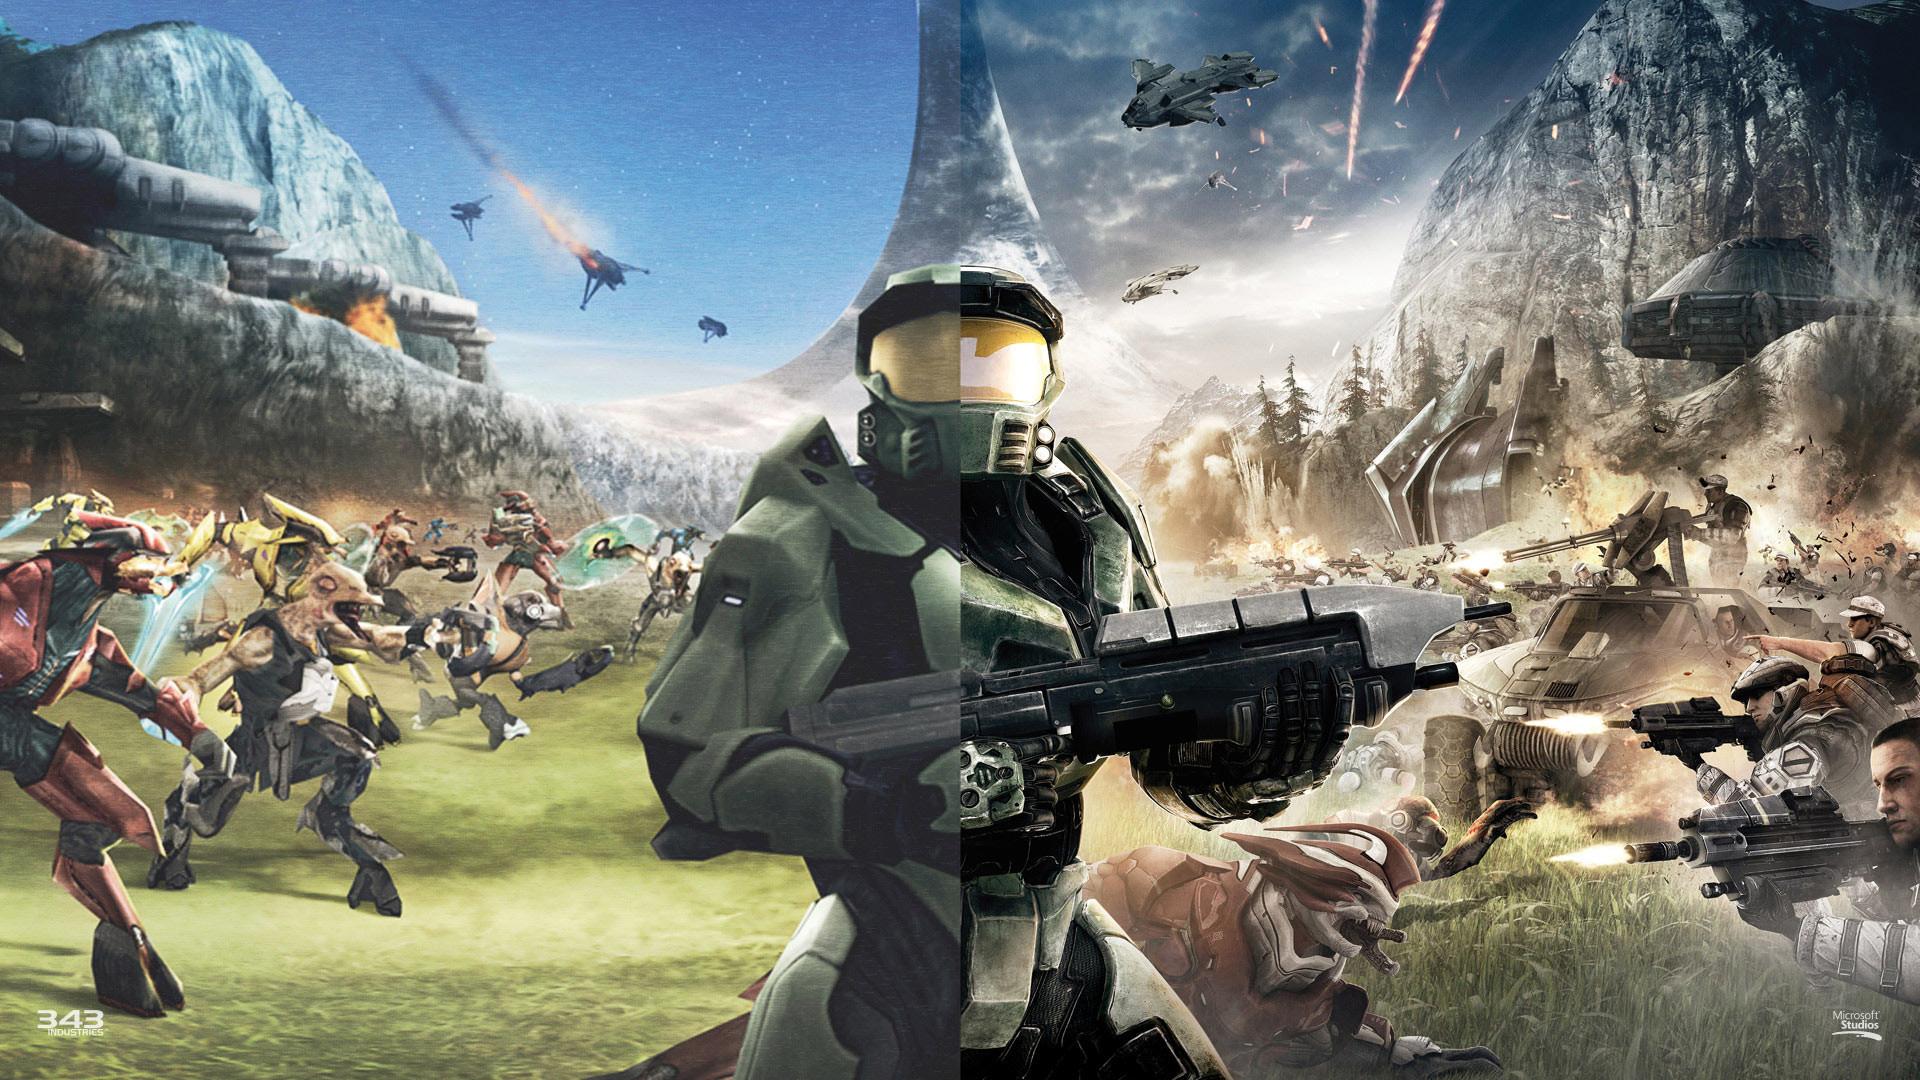 Halo Anniversary Wallpaper HD